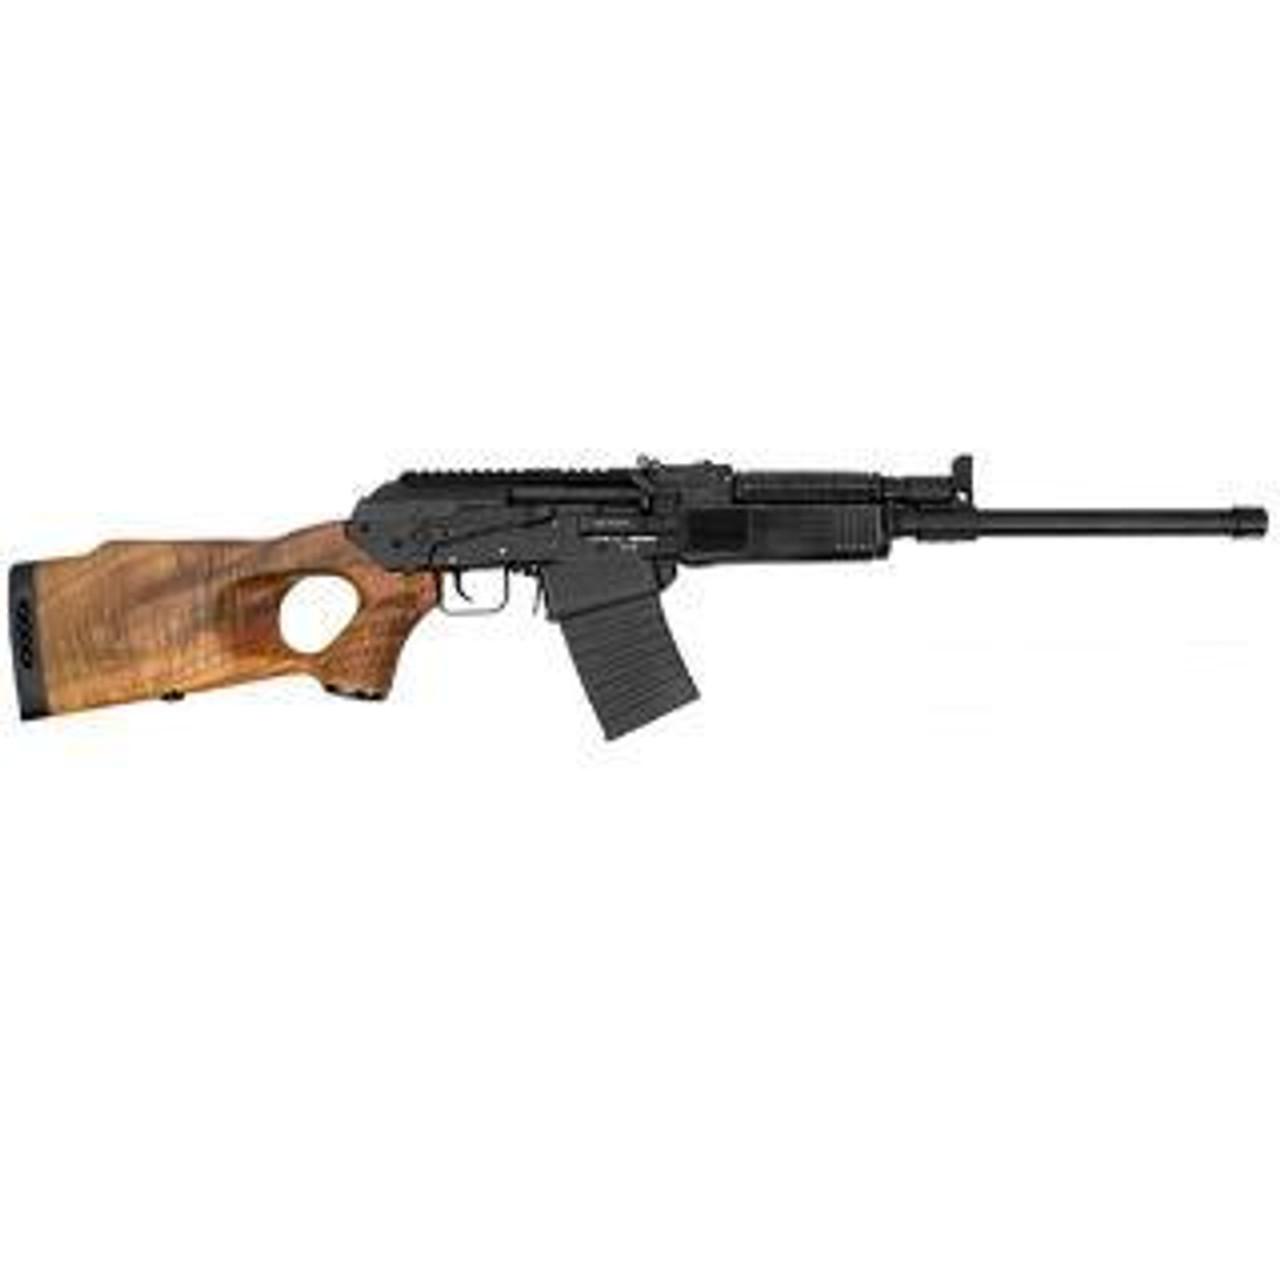 MOLOT VEPR VPR 12(wood stock)- CALIFORNIA LEGAL-12GA